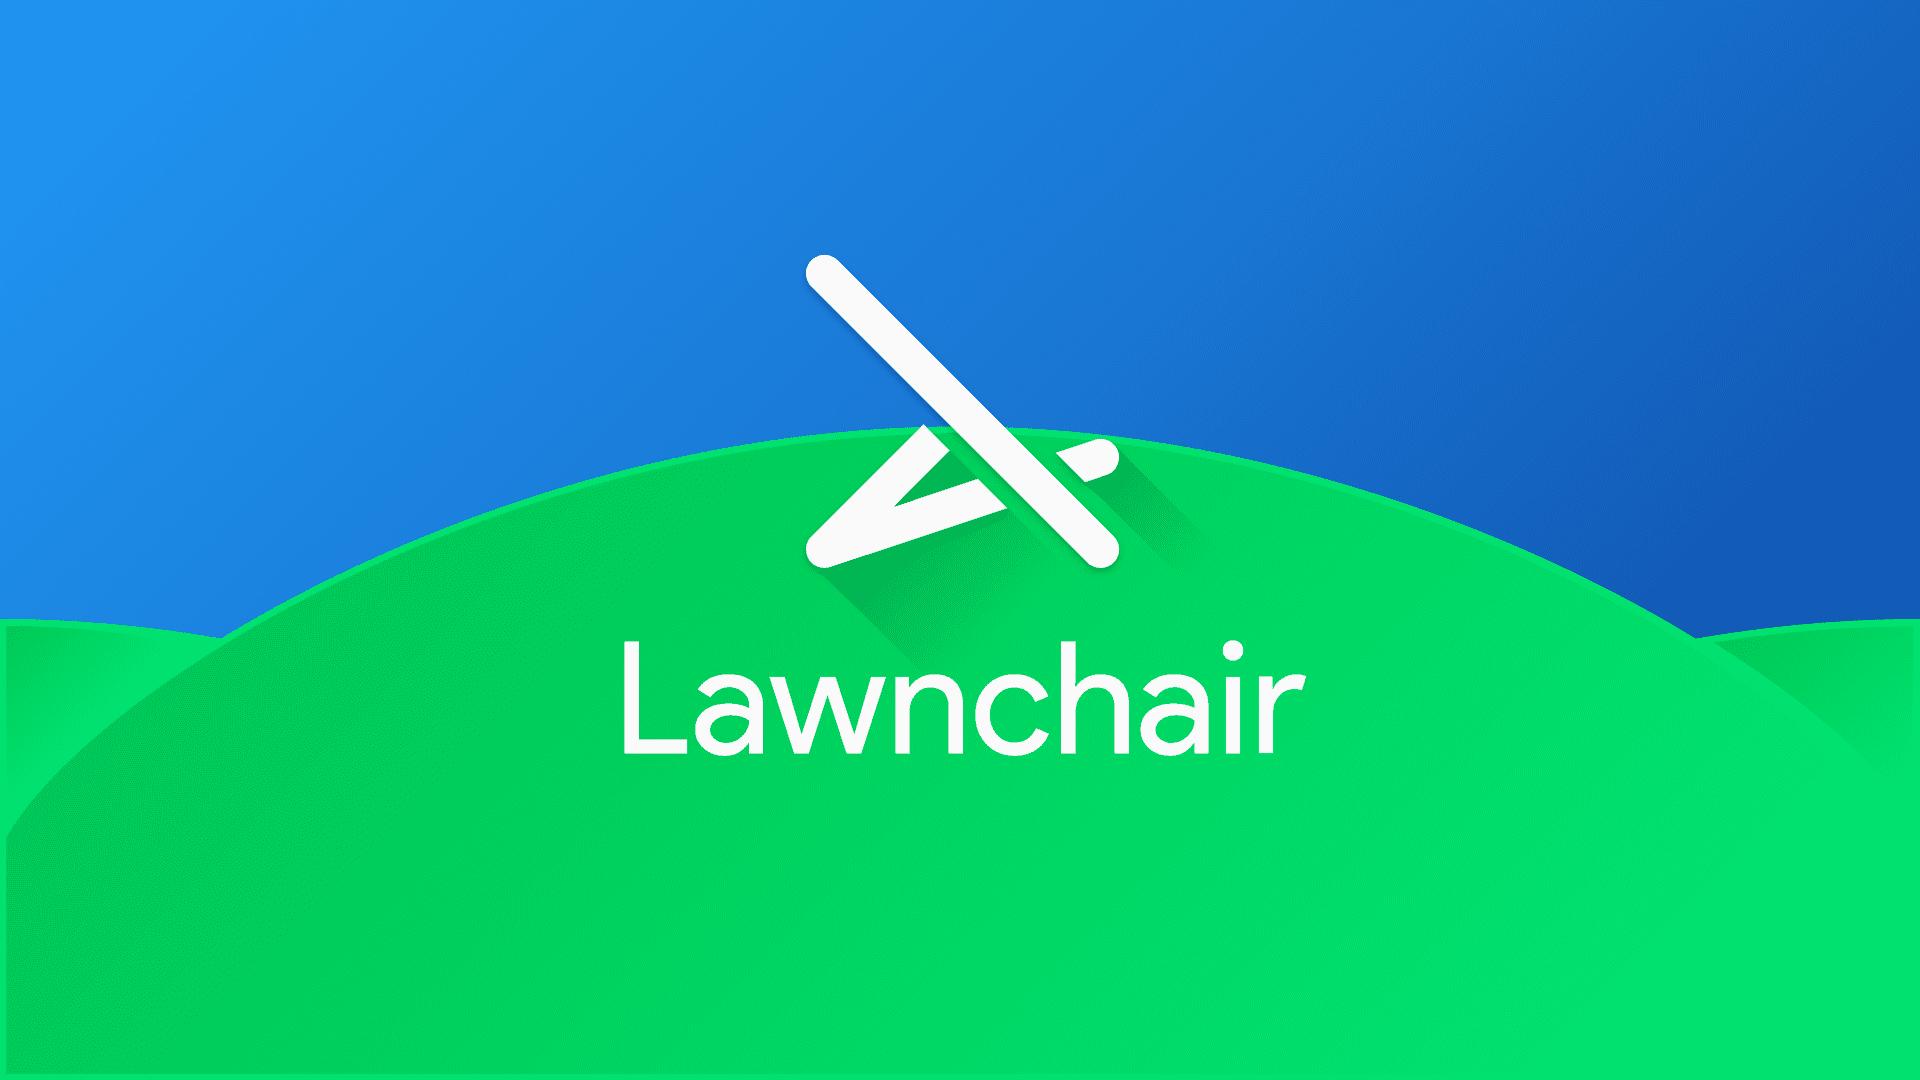 lawnchair